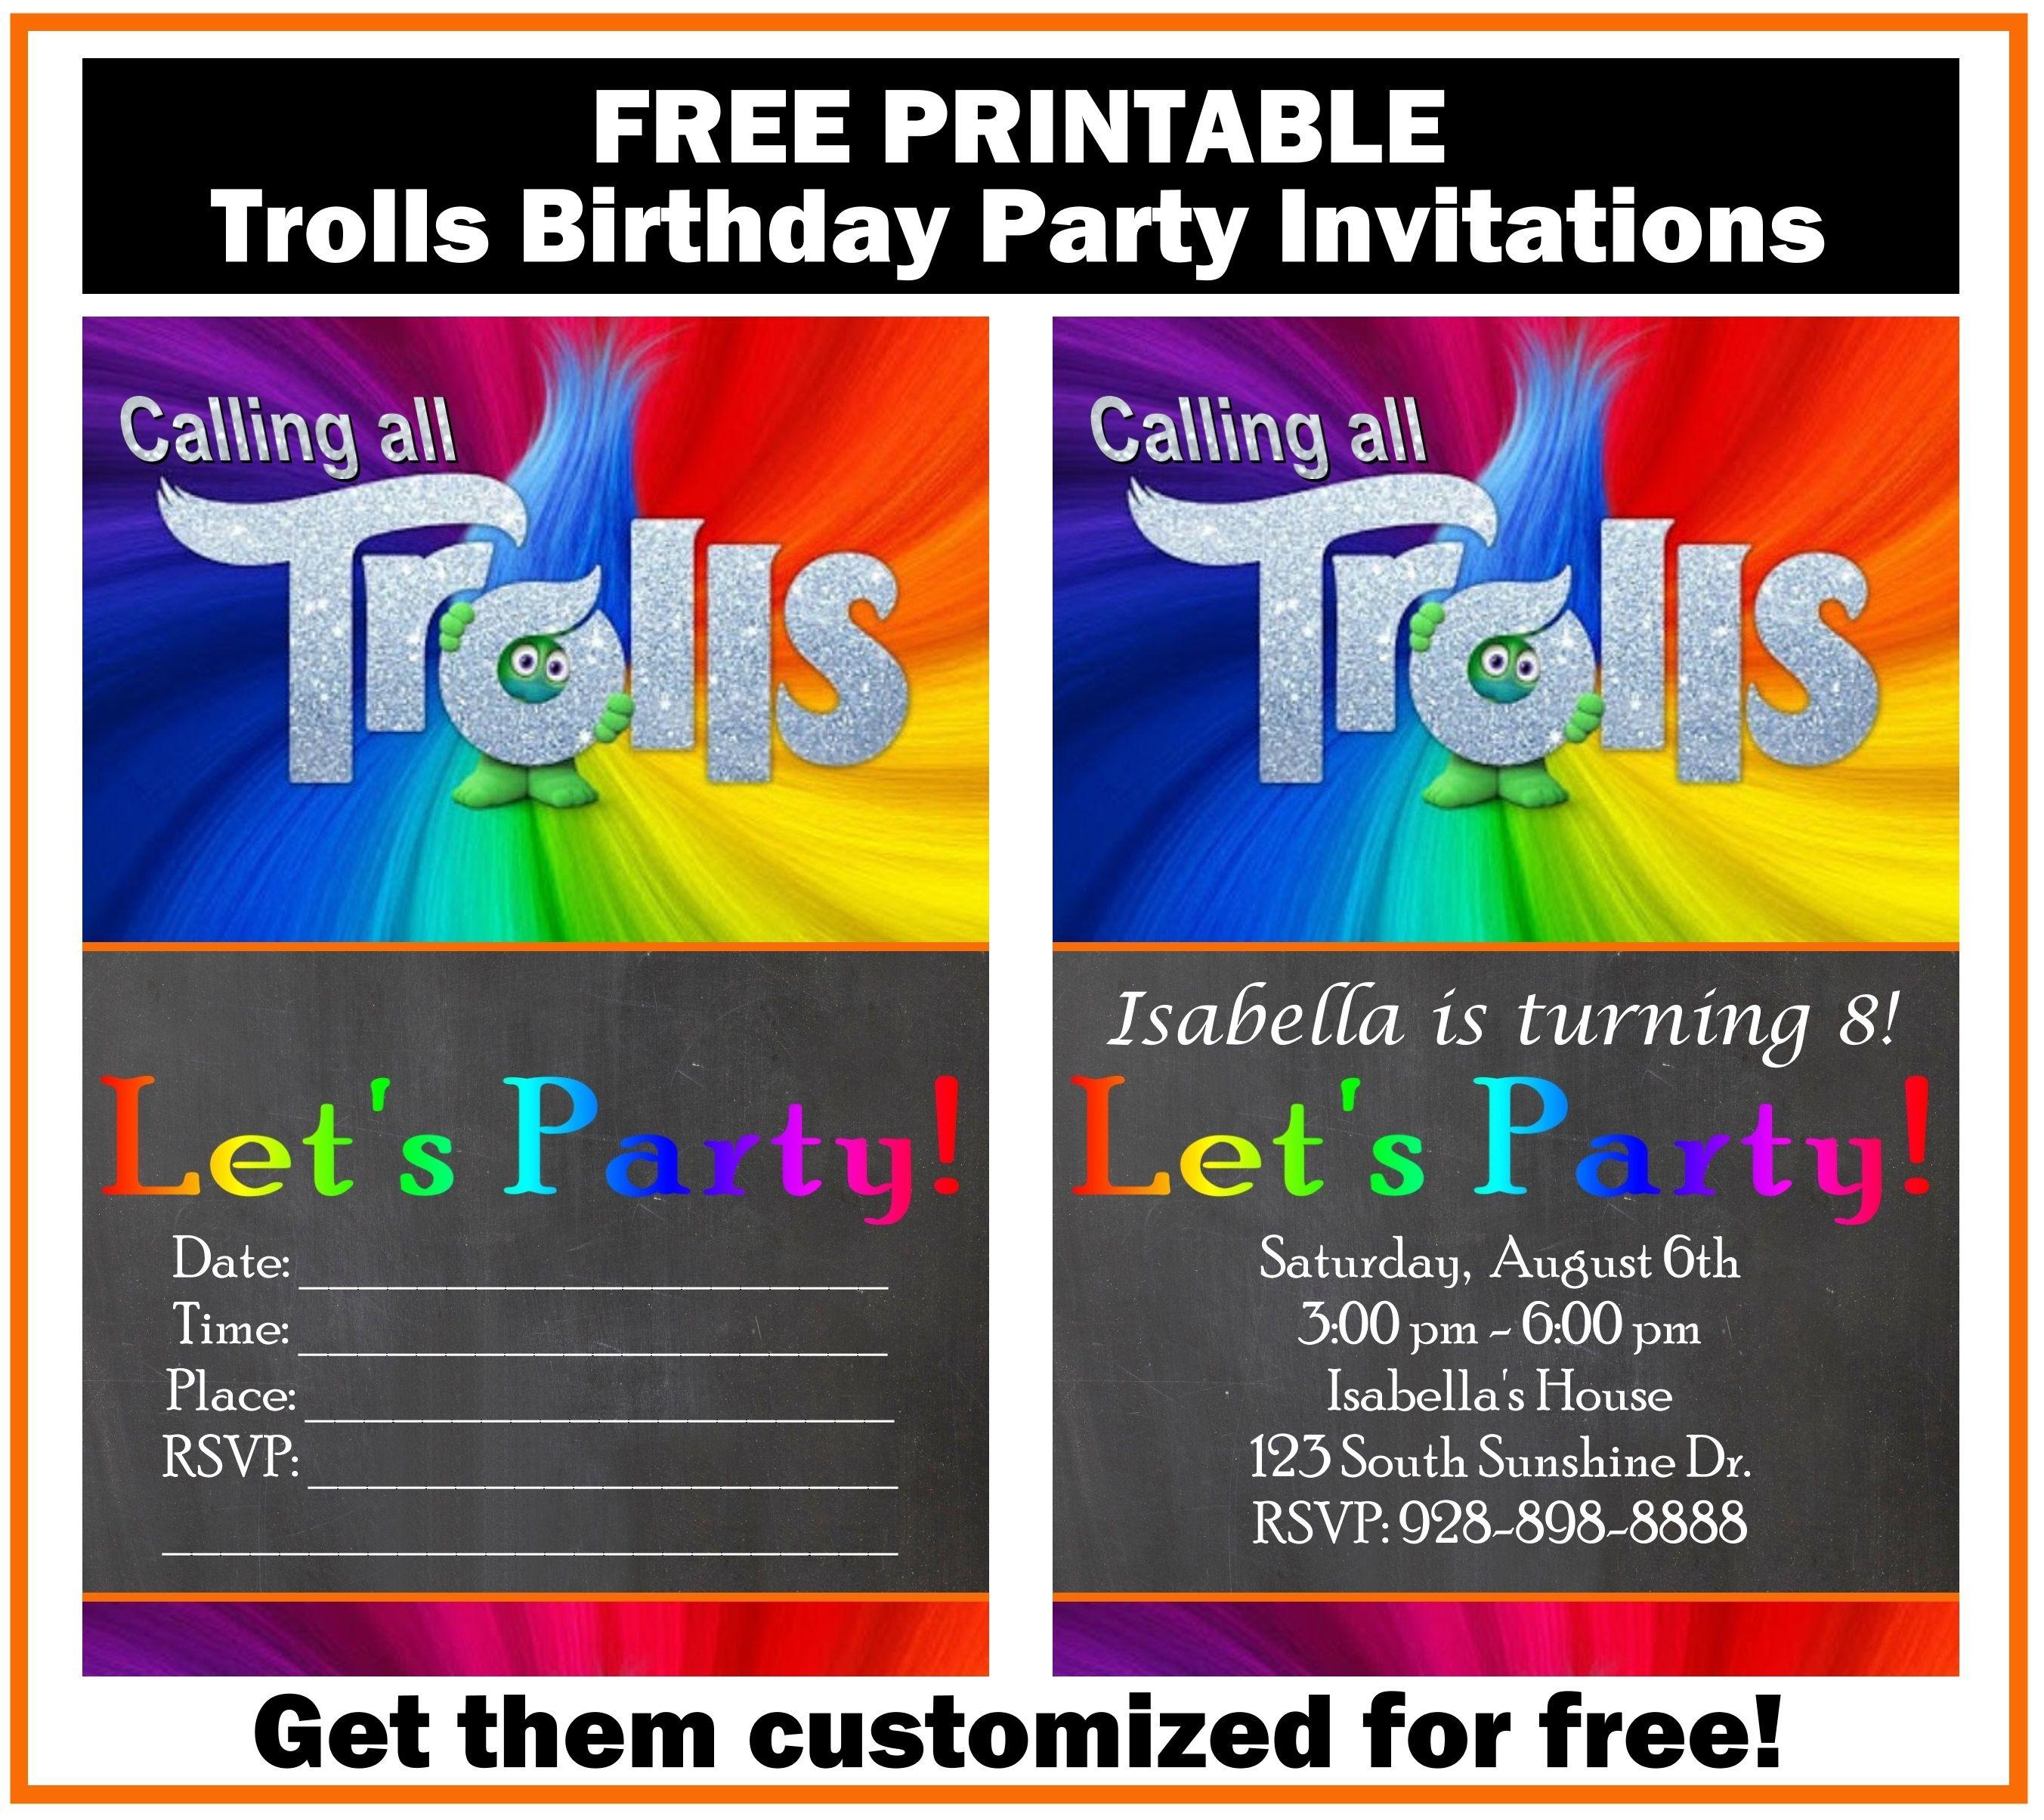 Free Trolls Birthday Party Invitation Printables | Trolls birthday ...